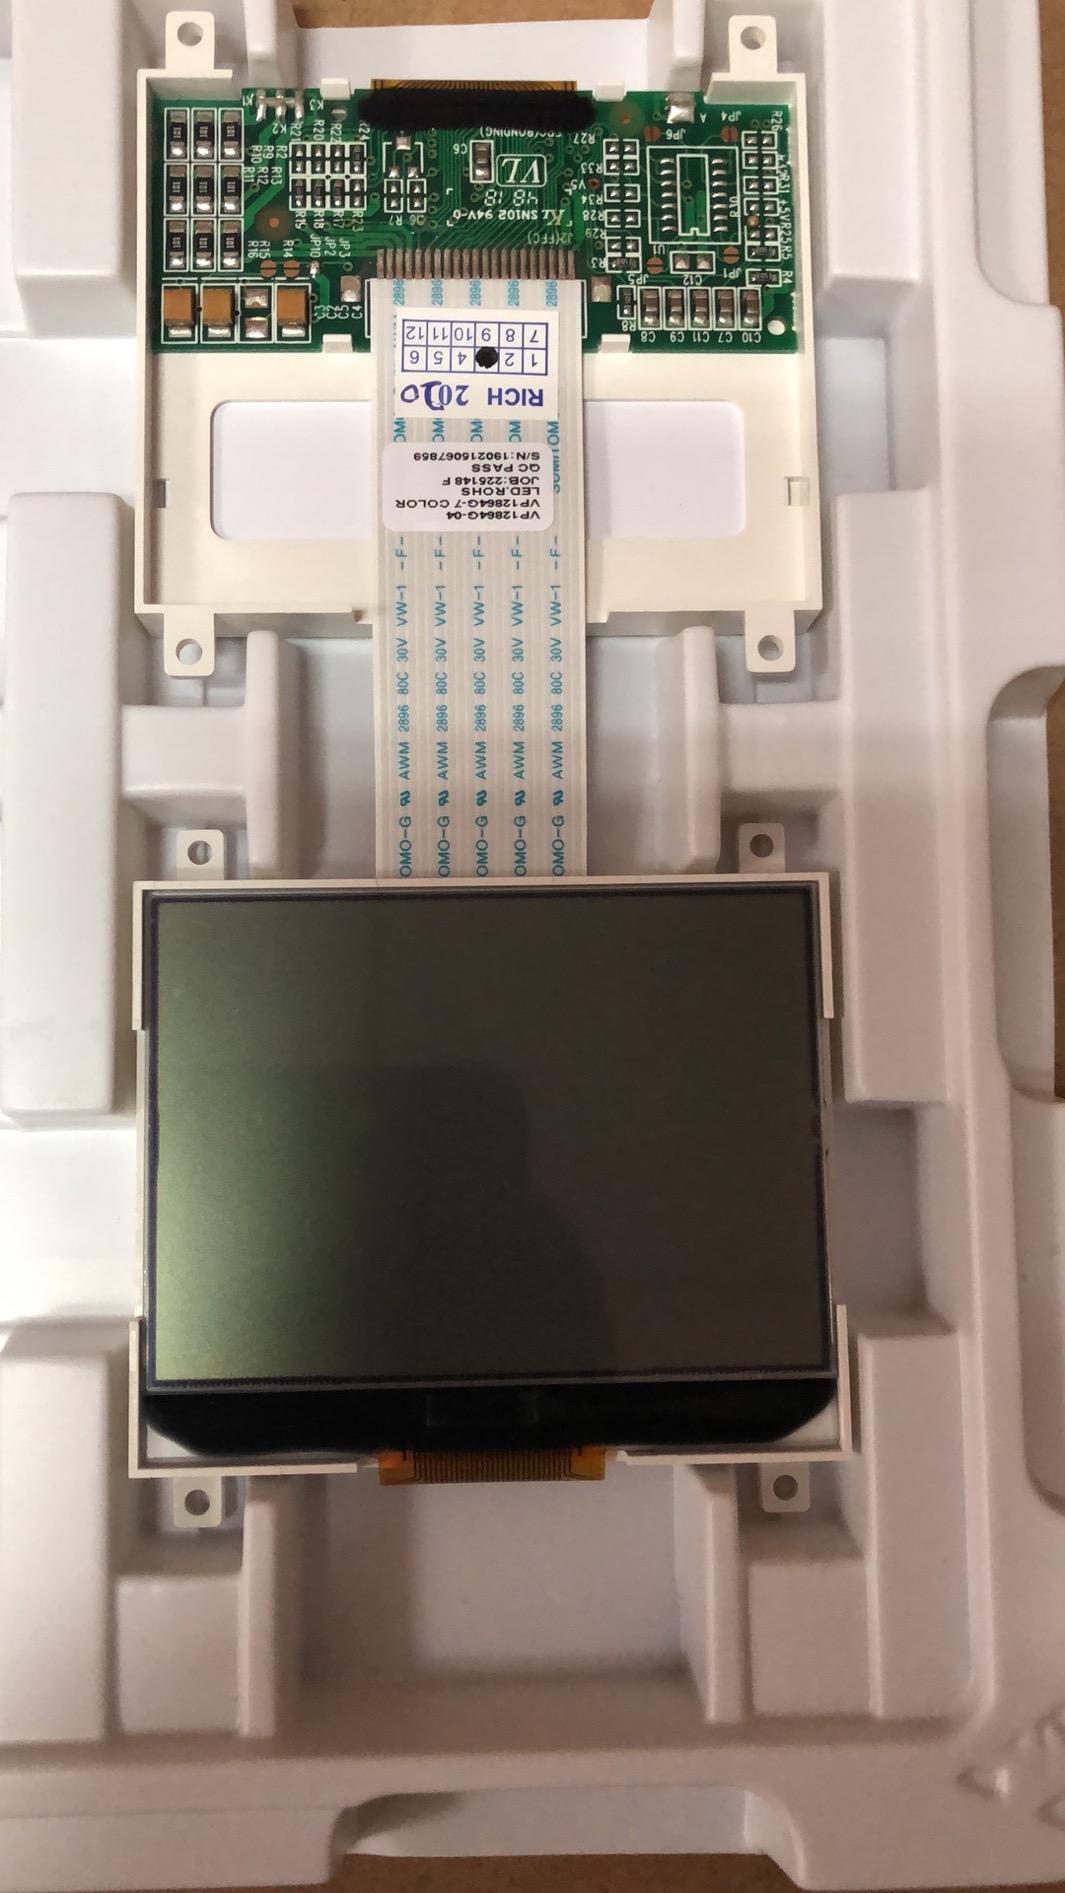 VP12864G-01 LCD display panel stock